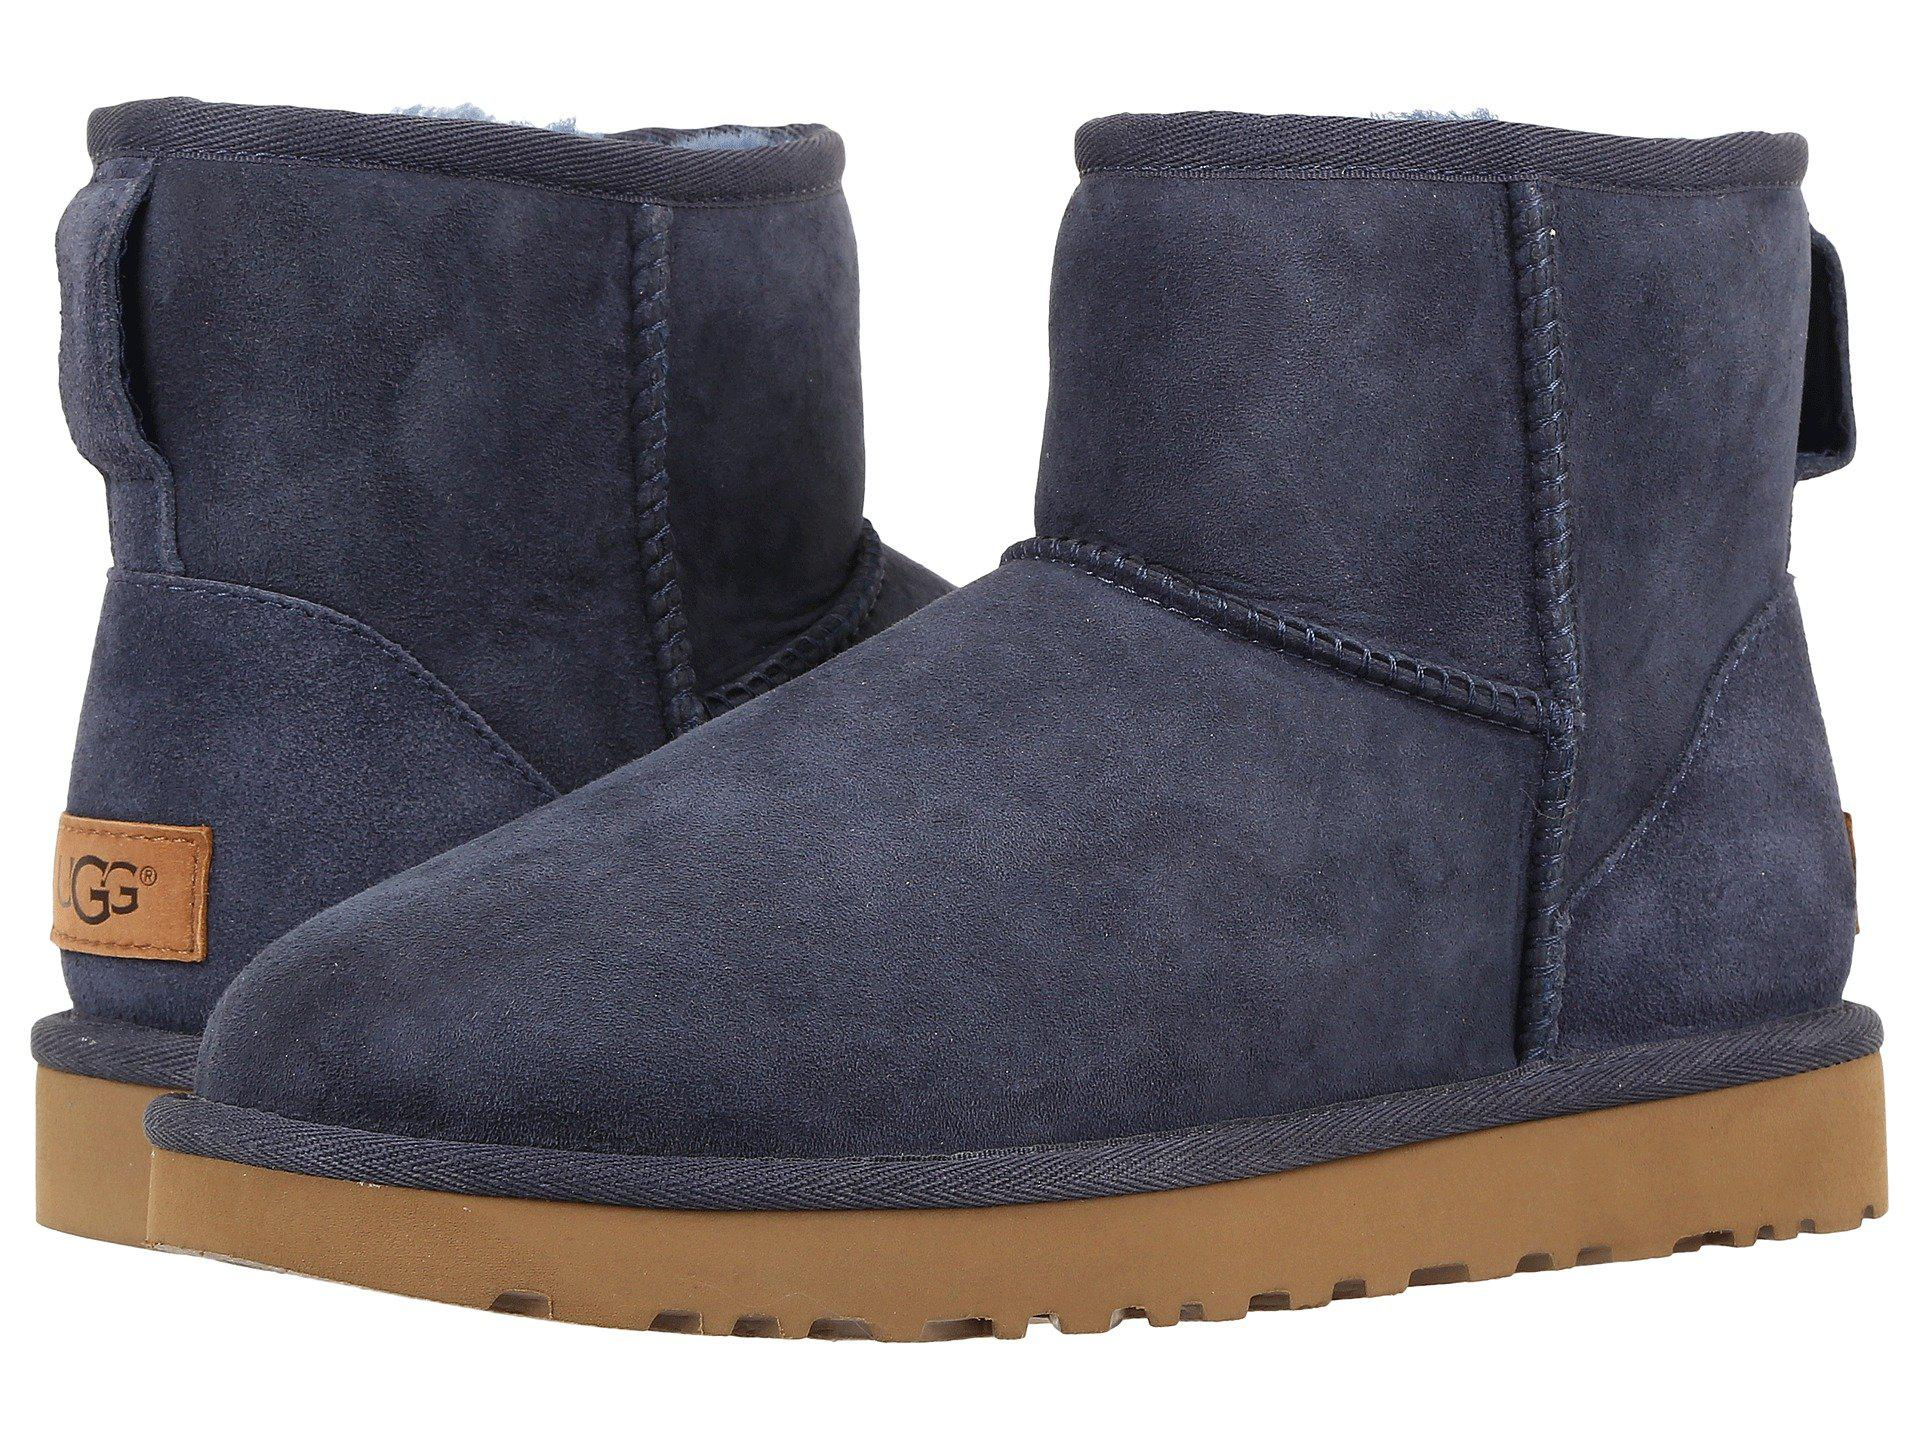 debe3365e01 Lyst - UGG Classic Mini Ii (boadacious Pink) Women's Boots in Blue ...